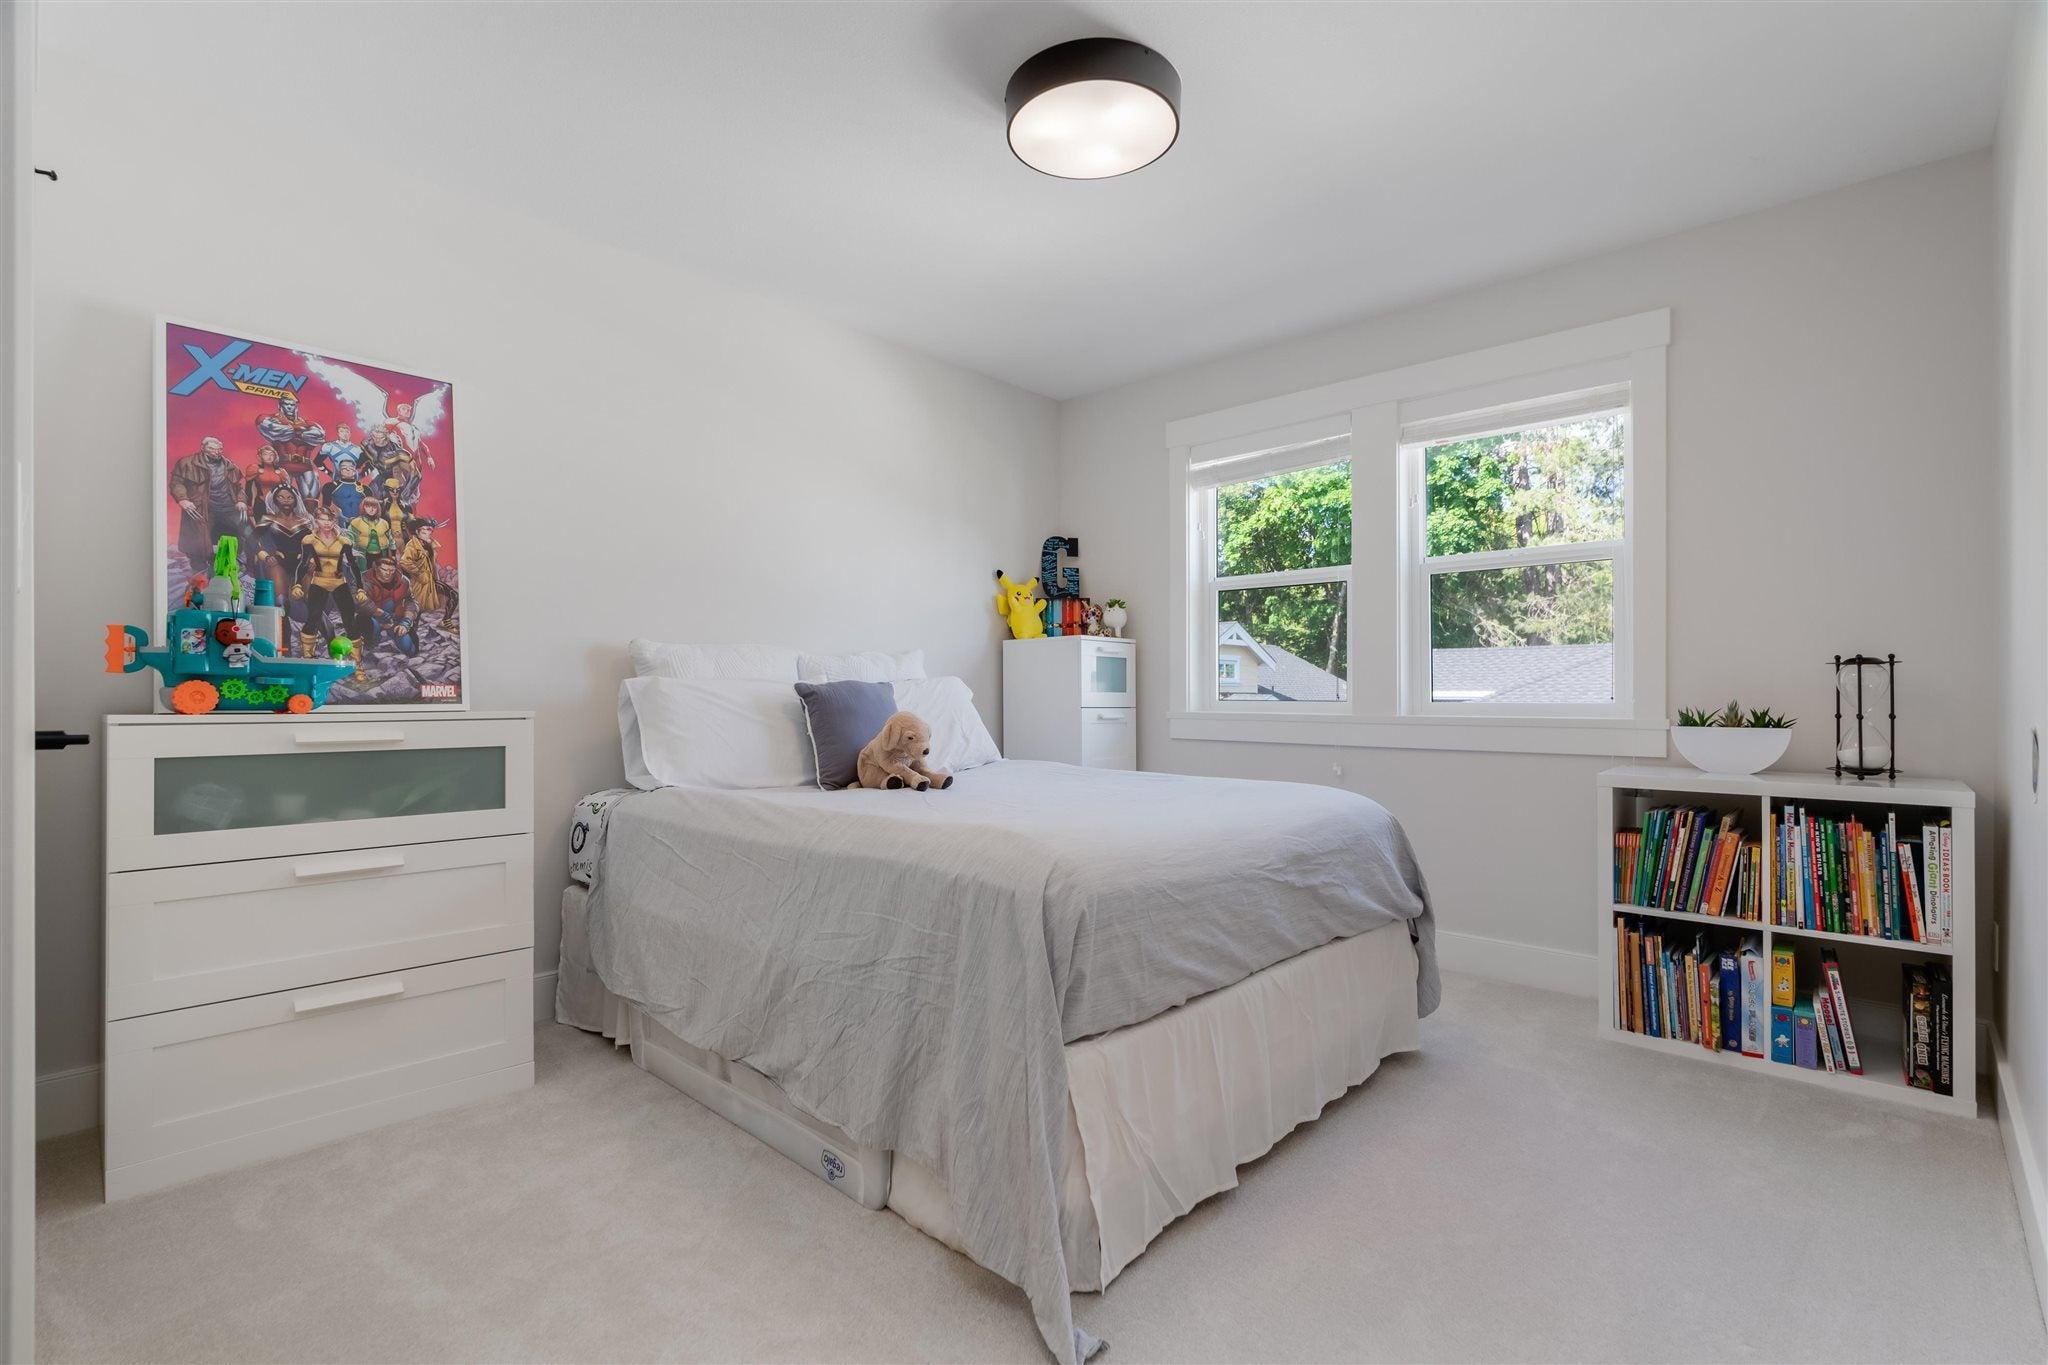 40 21858 47B AVENUE - Murrayville Townhouse for sale, 4 Bedrooms (R2603956) - #21